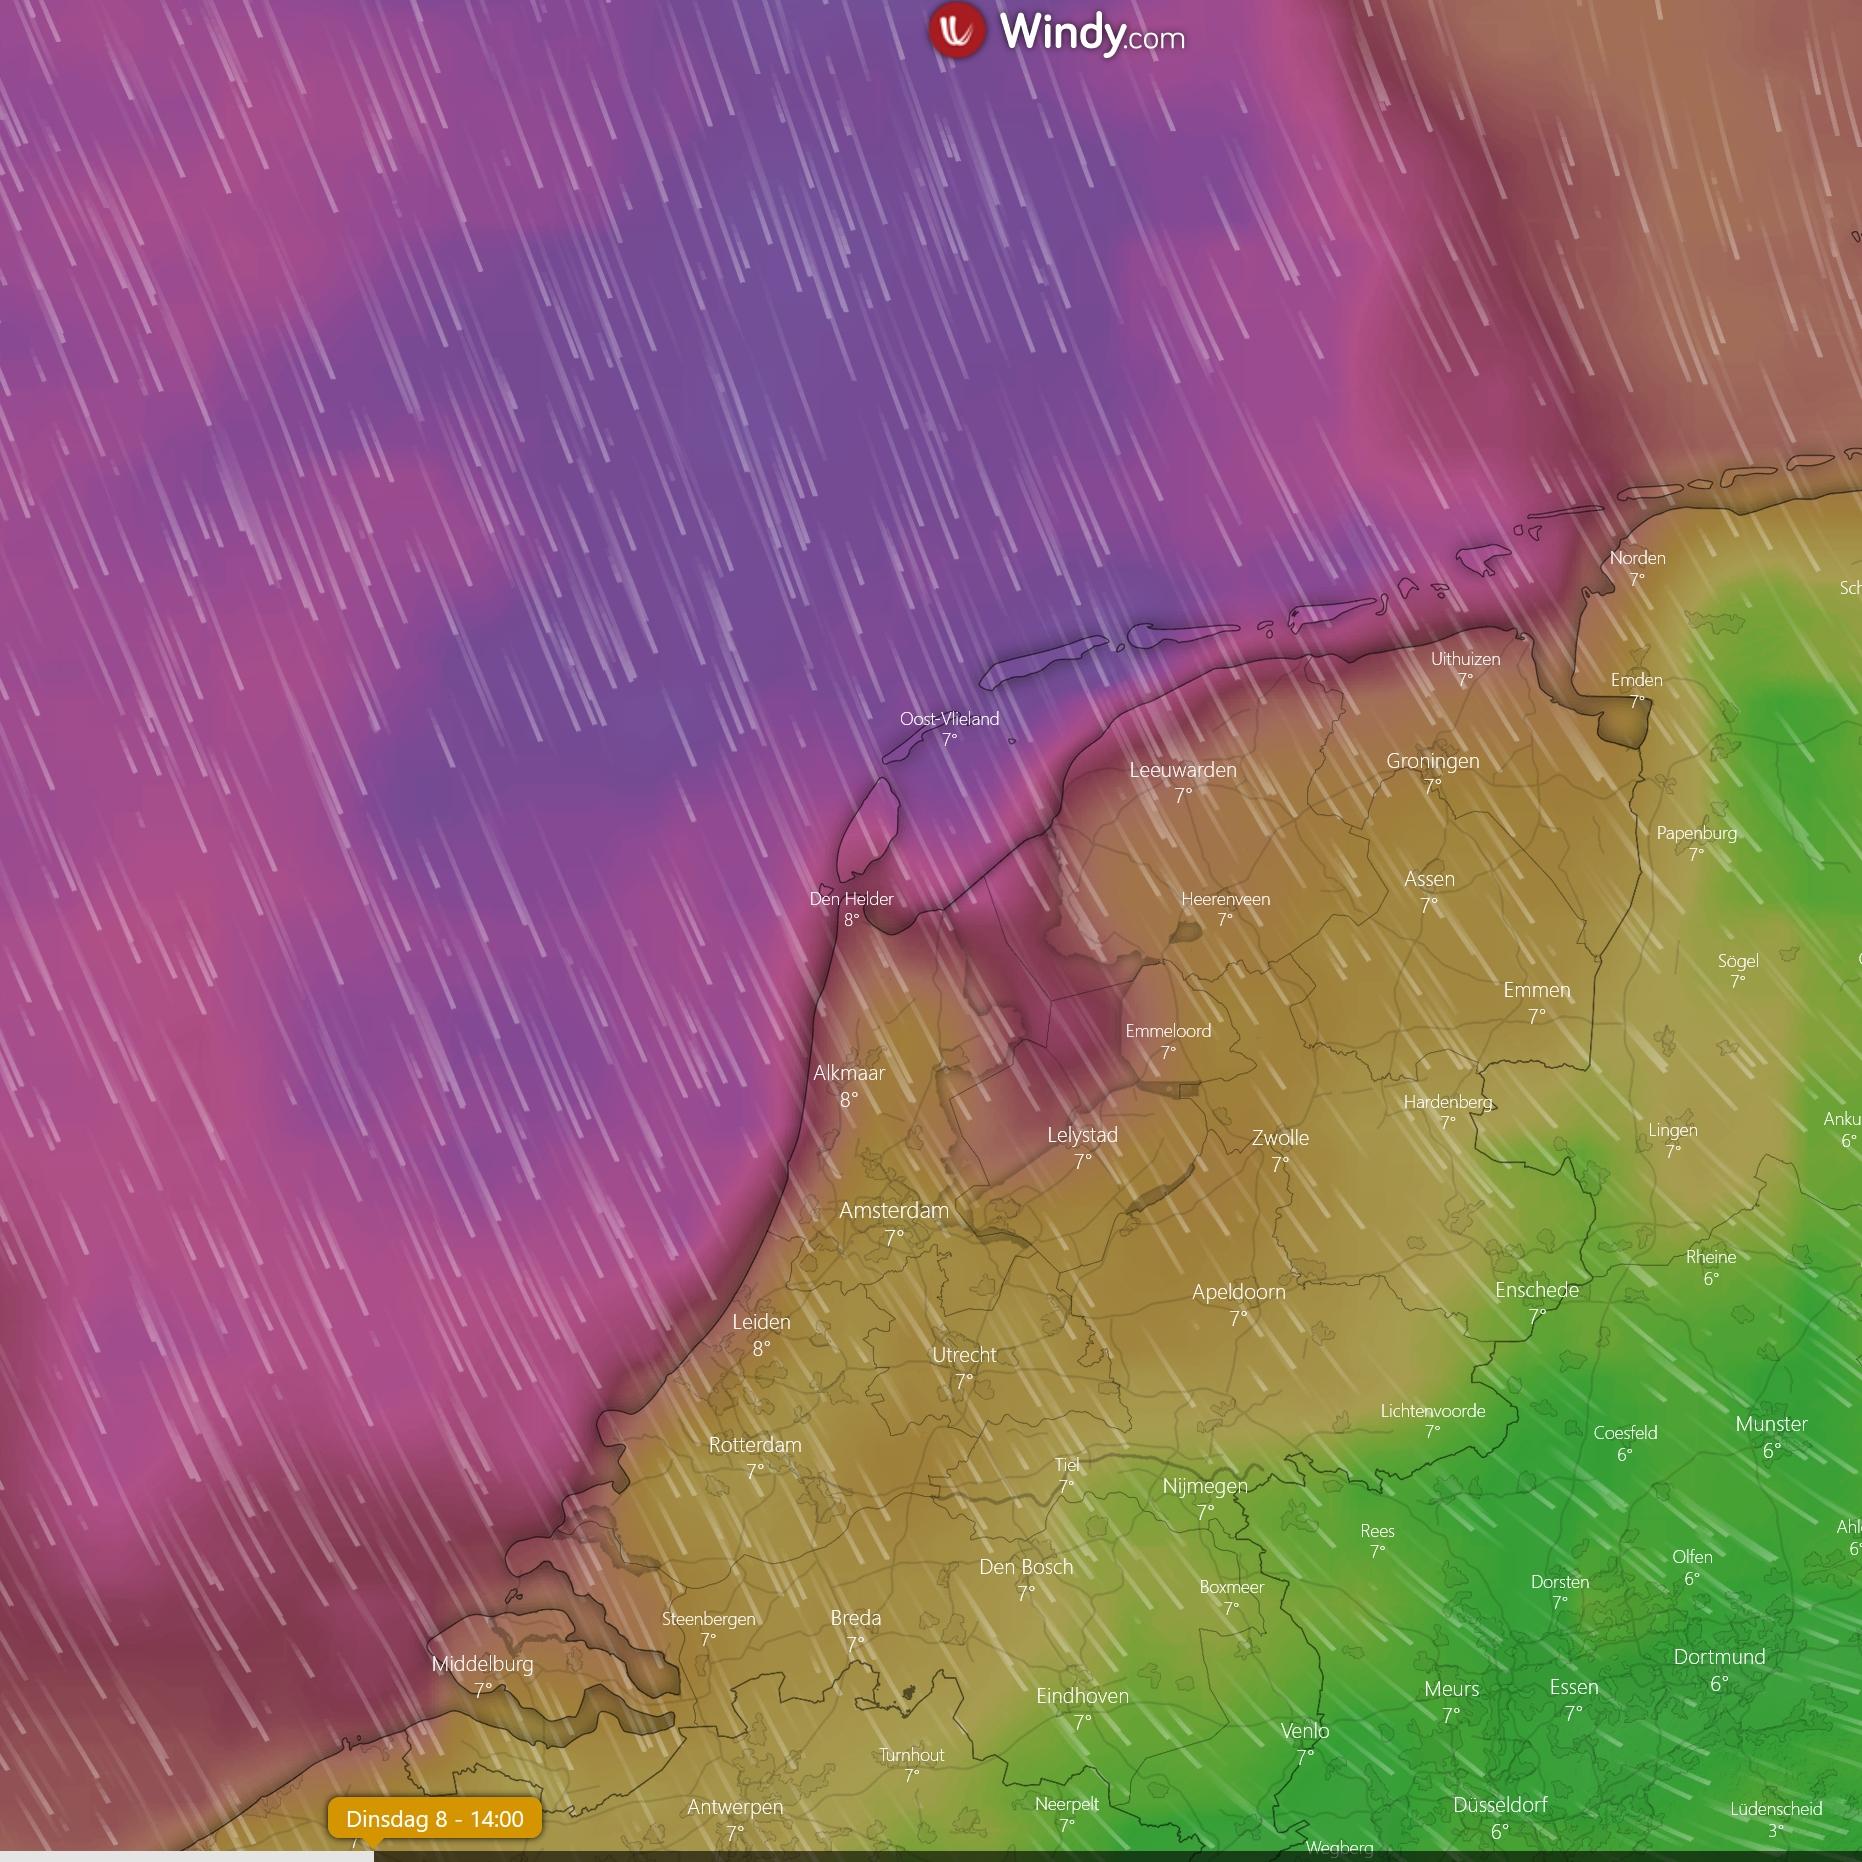 Windystorm.jpg